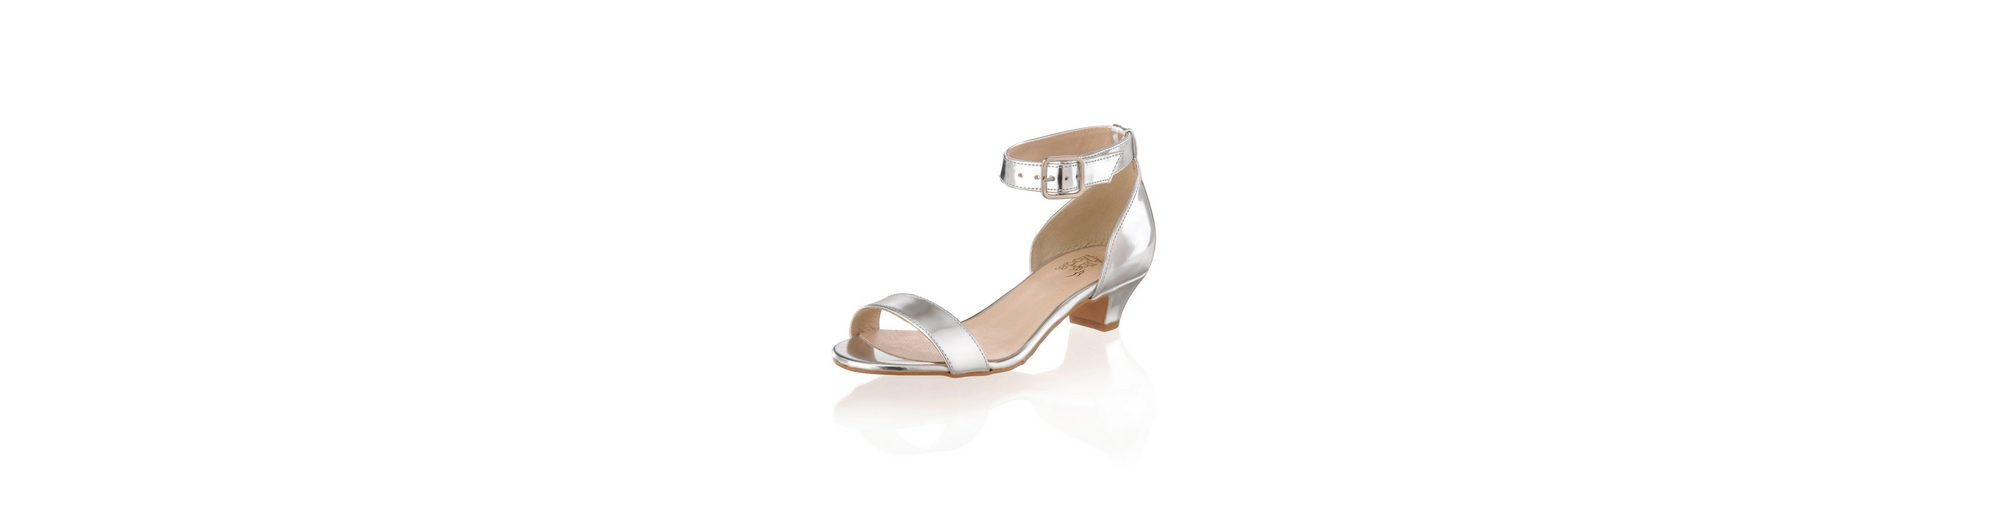 Alba Moda Sandalette in metallic-Optik